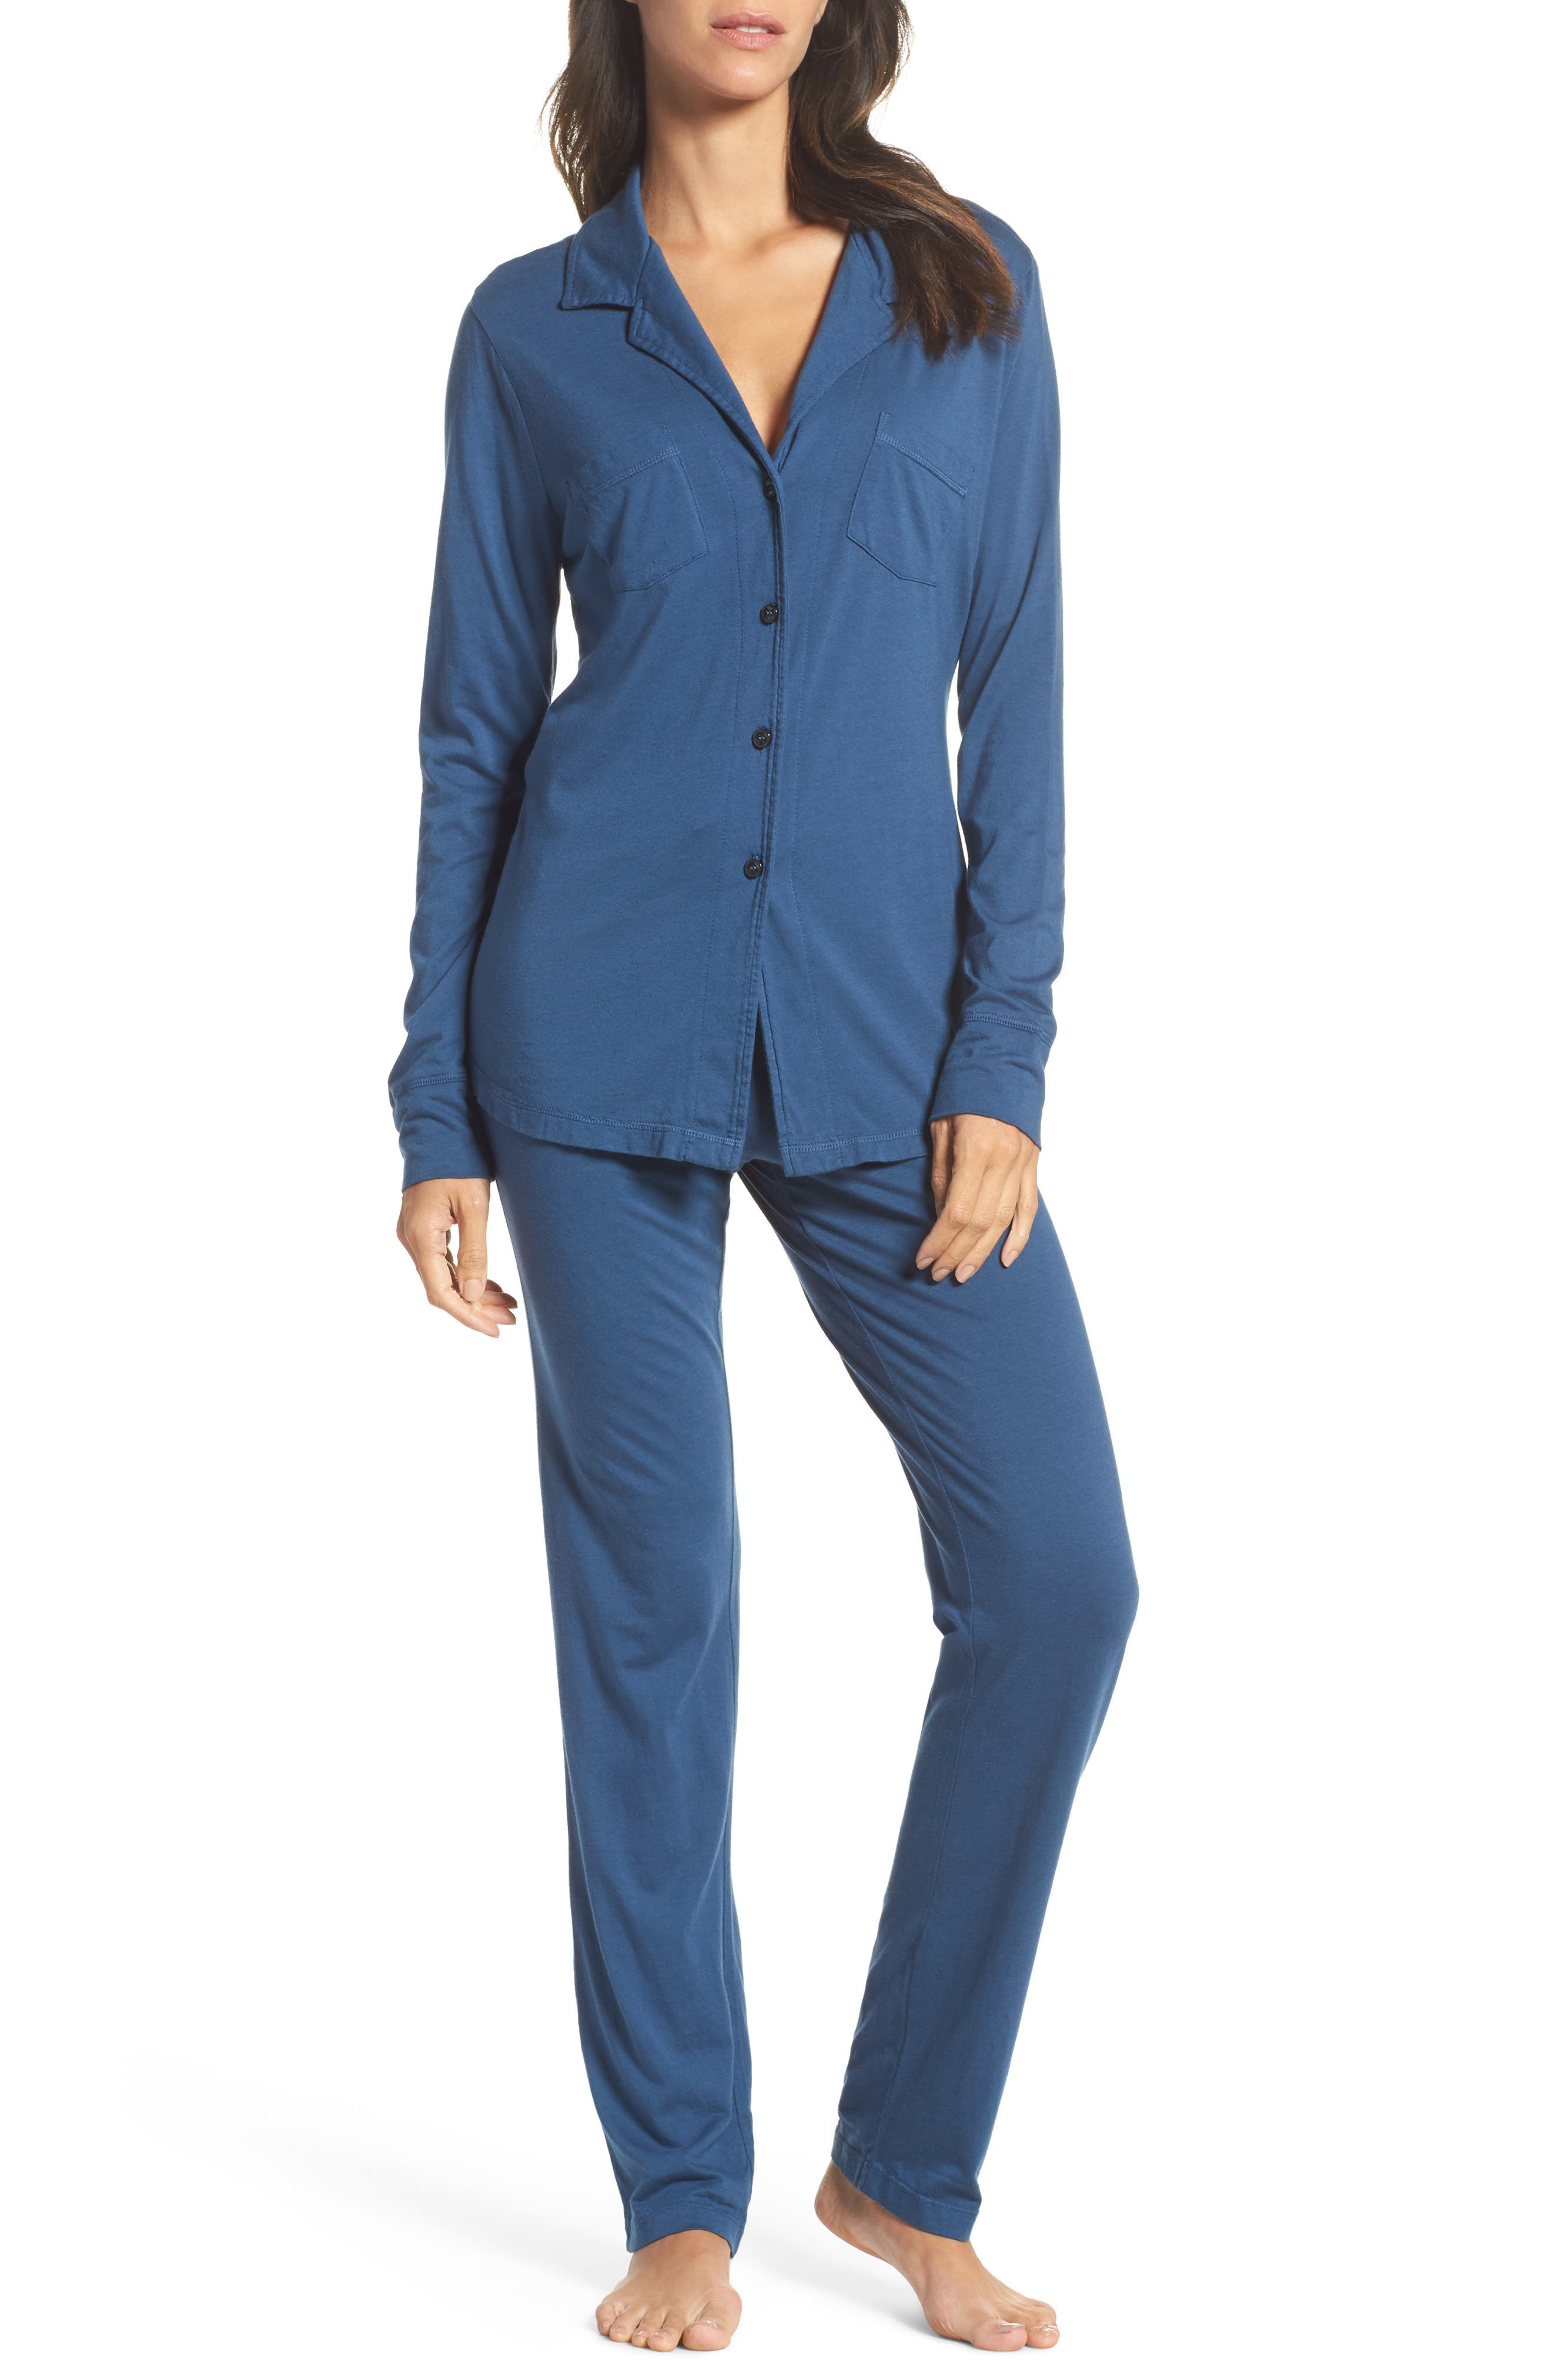 Main Image - LOVE+GRACE 'Cassie' Cotton & Modal Pajamas